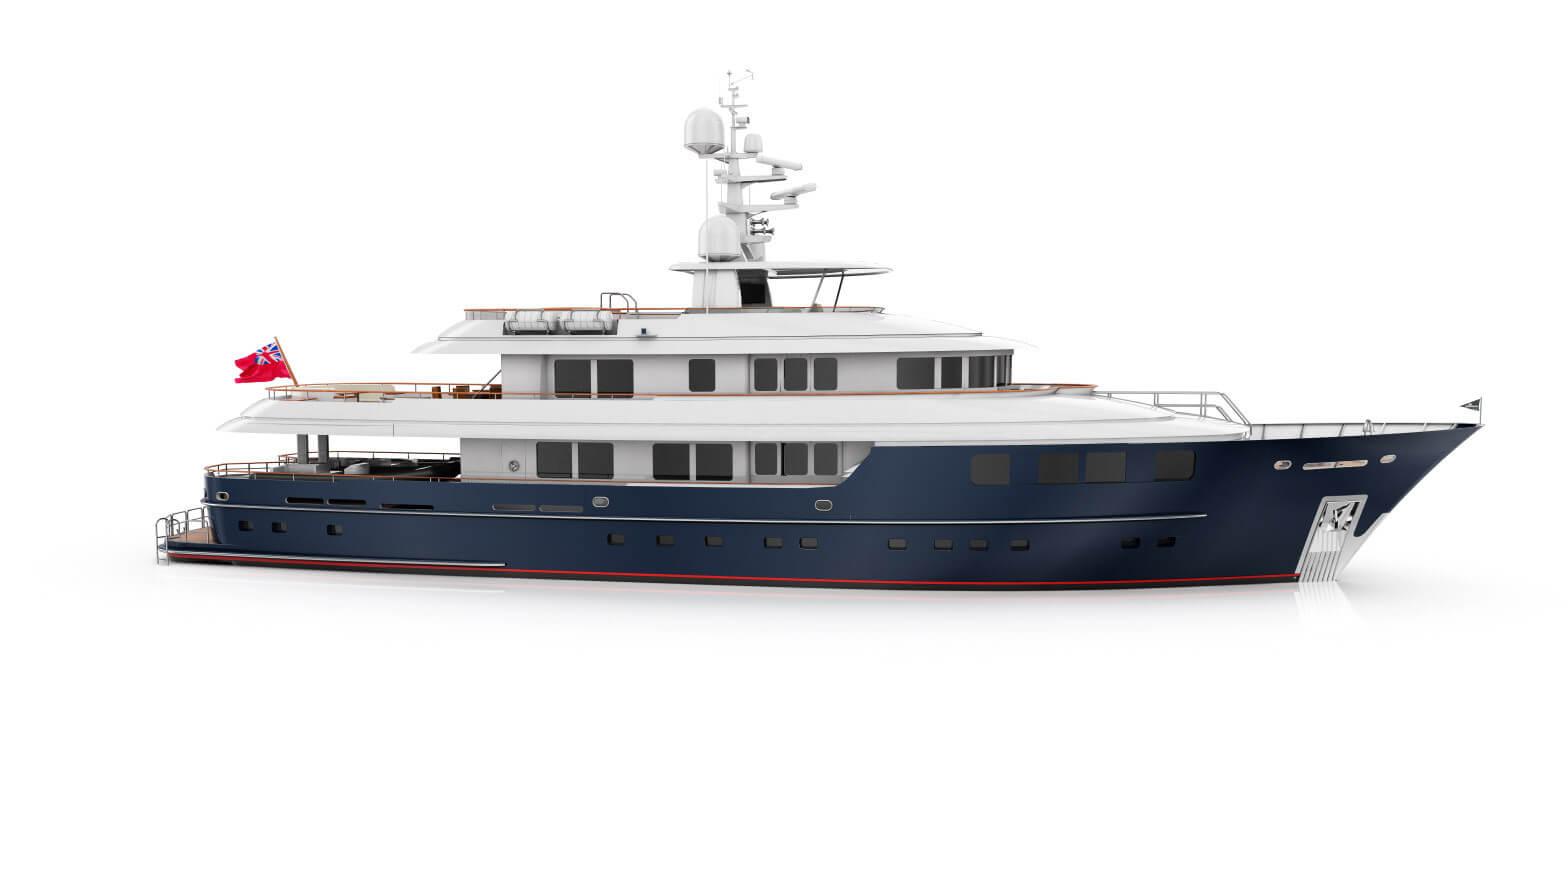 Superyacht Ocean's Seven